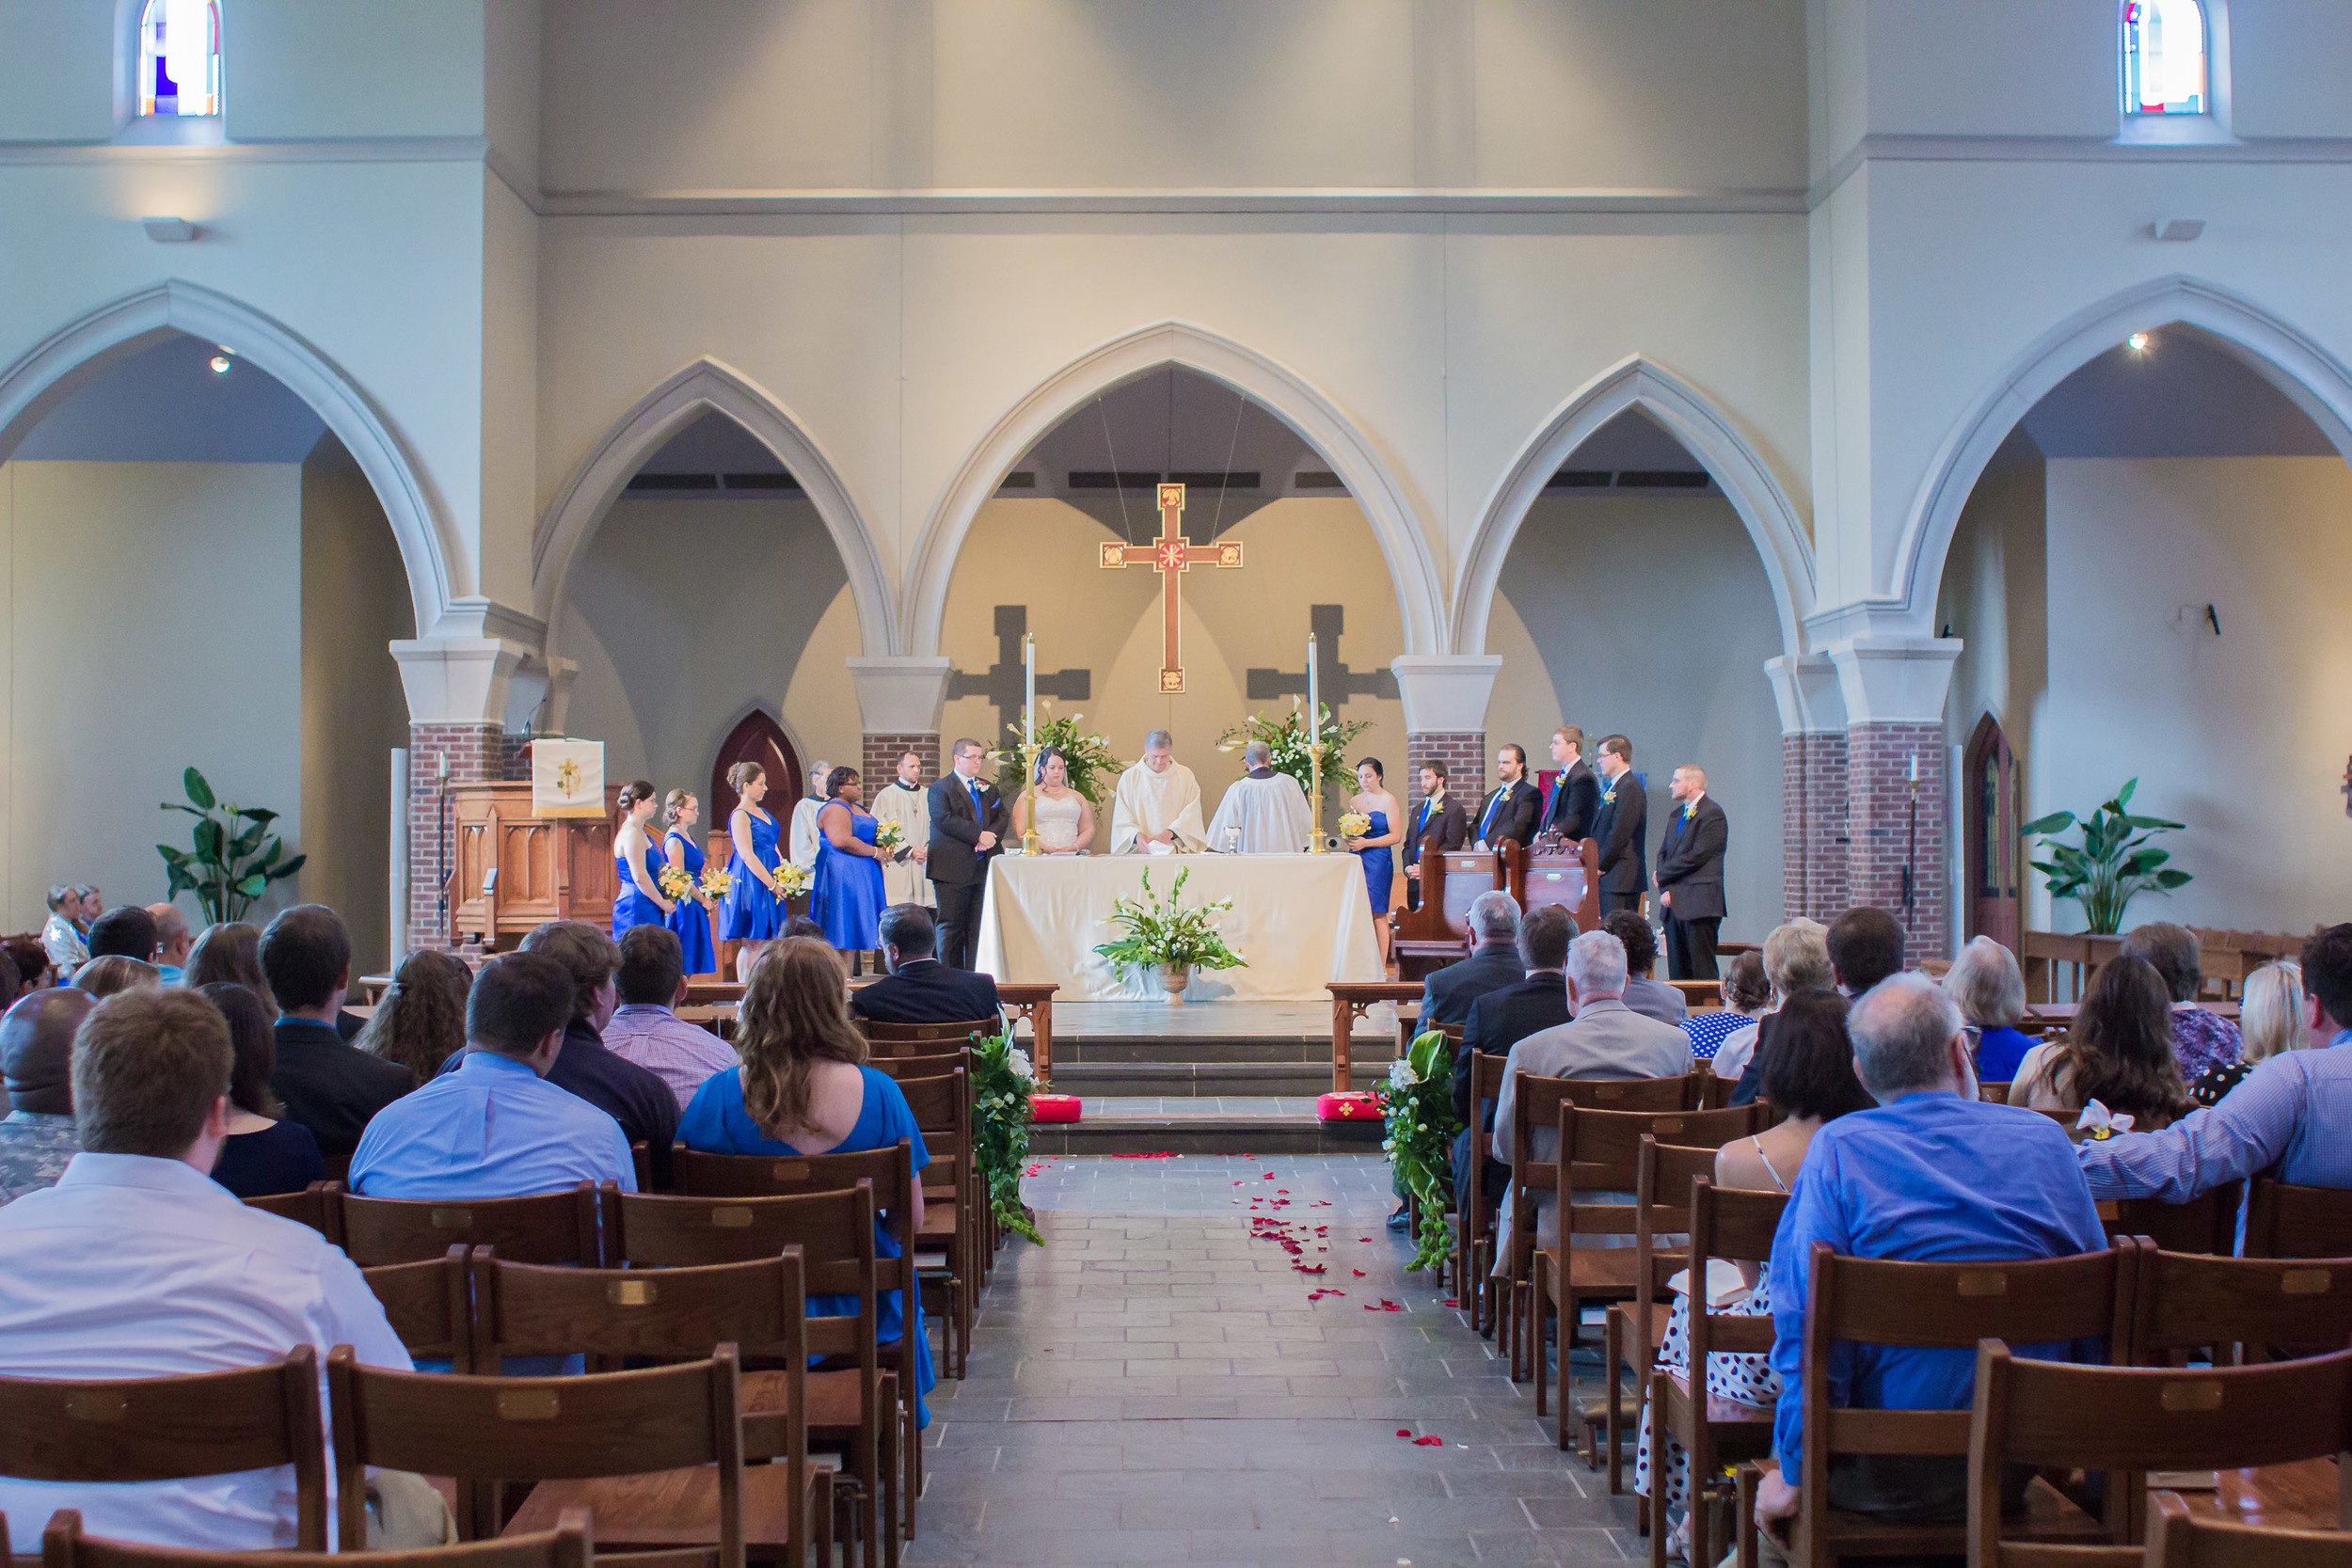 st-pauls-episcopal-wedding-greenville-nc-bryant-tyson-photography-mike-vivian-blackmon